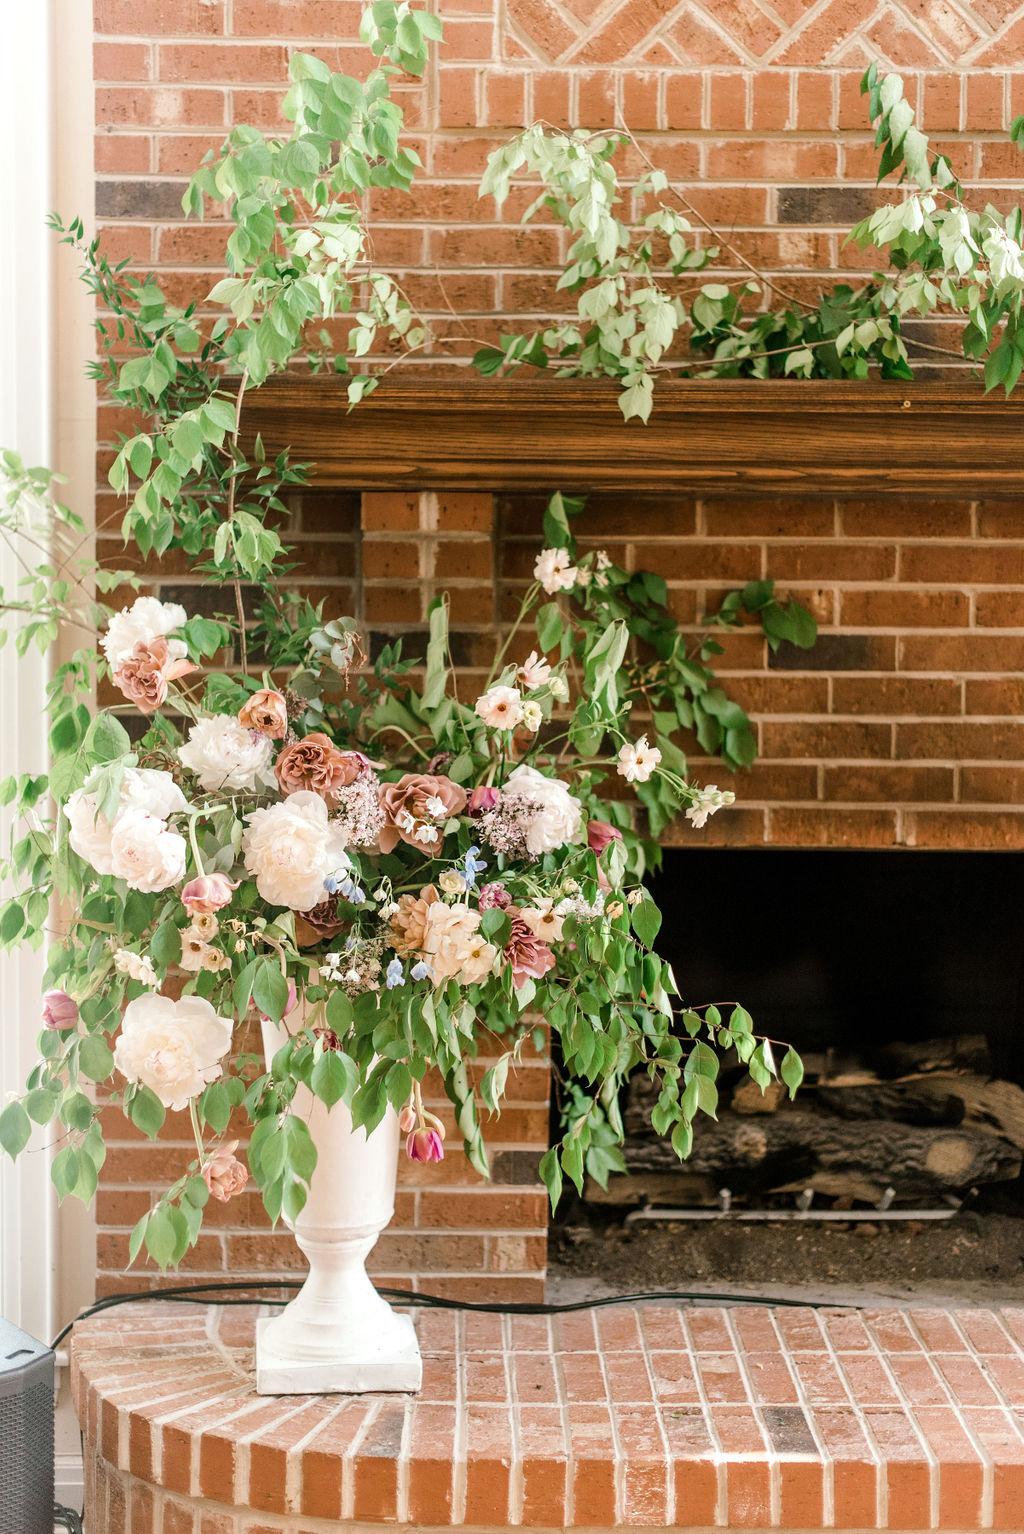 cincinnati-wedding-planner-estate-at-sunset-farm-wedding-fireplace-floral-installation